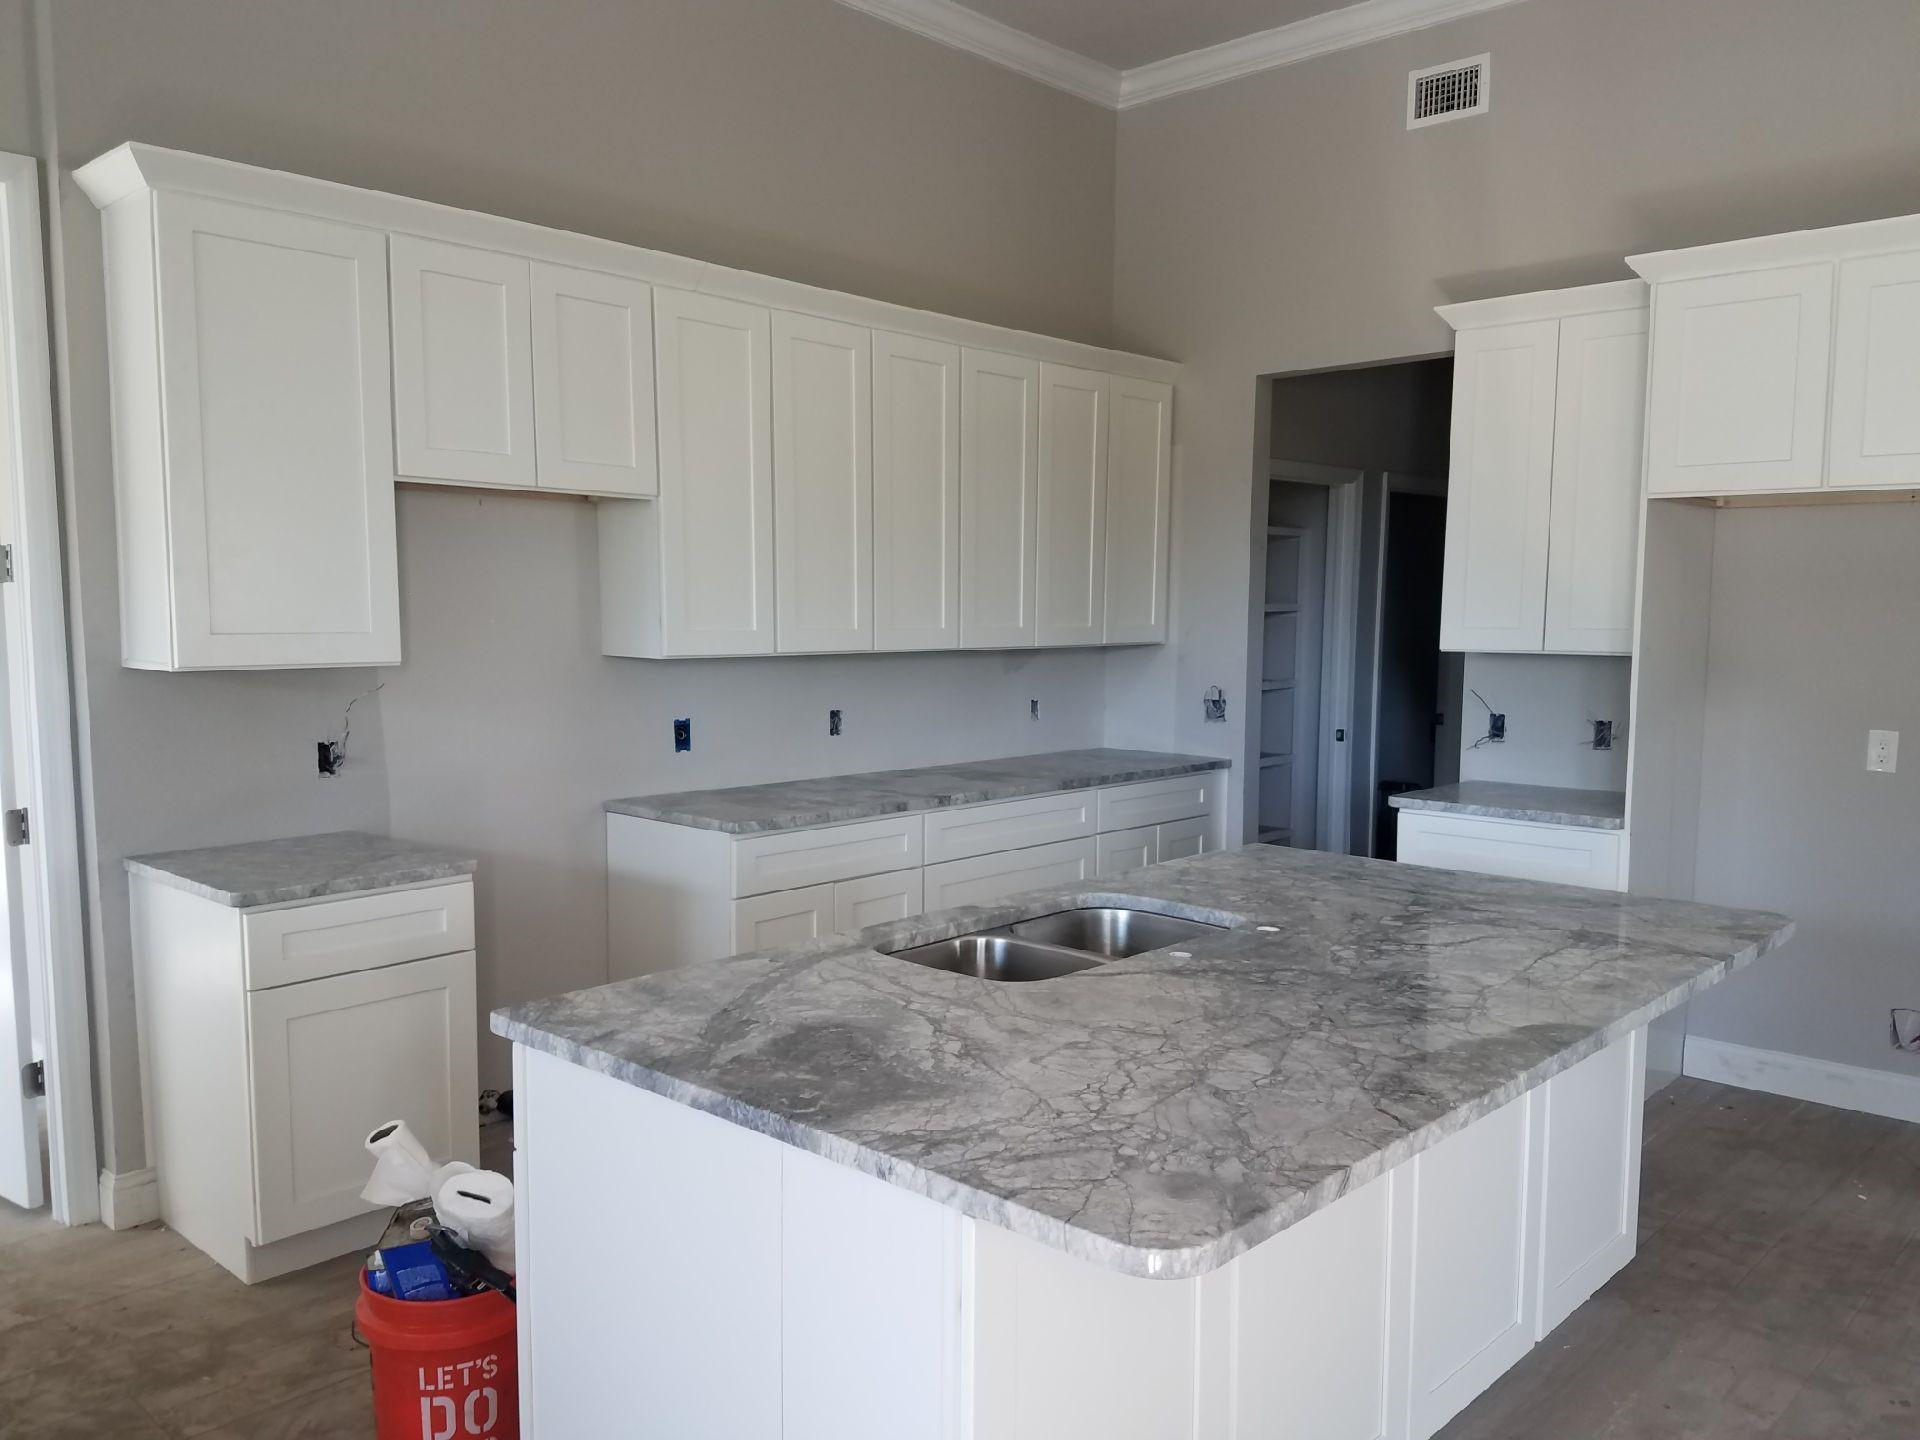 Super White Quartzite Kitchen Counter Tops In Valrico Florida